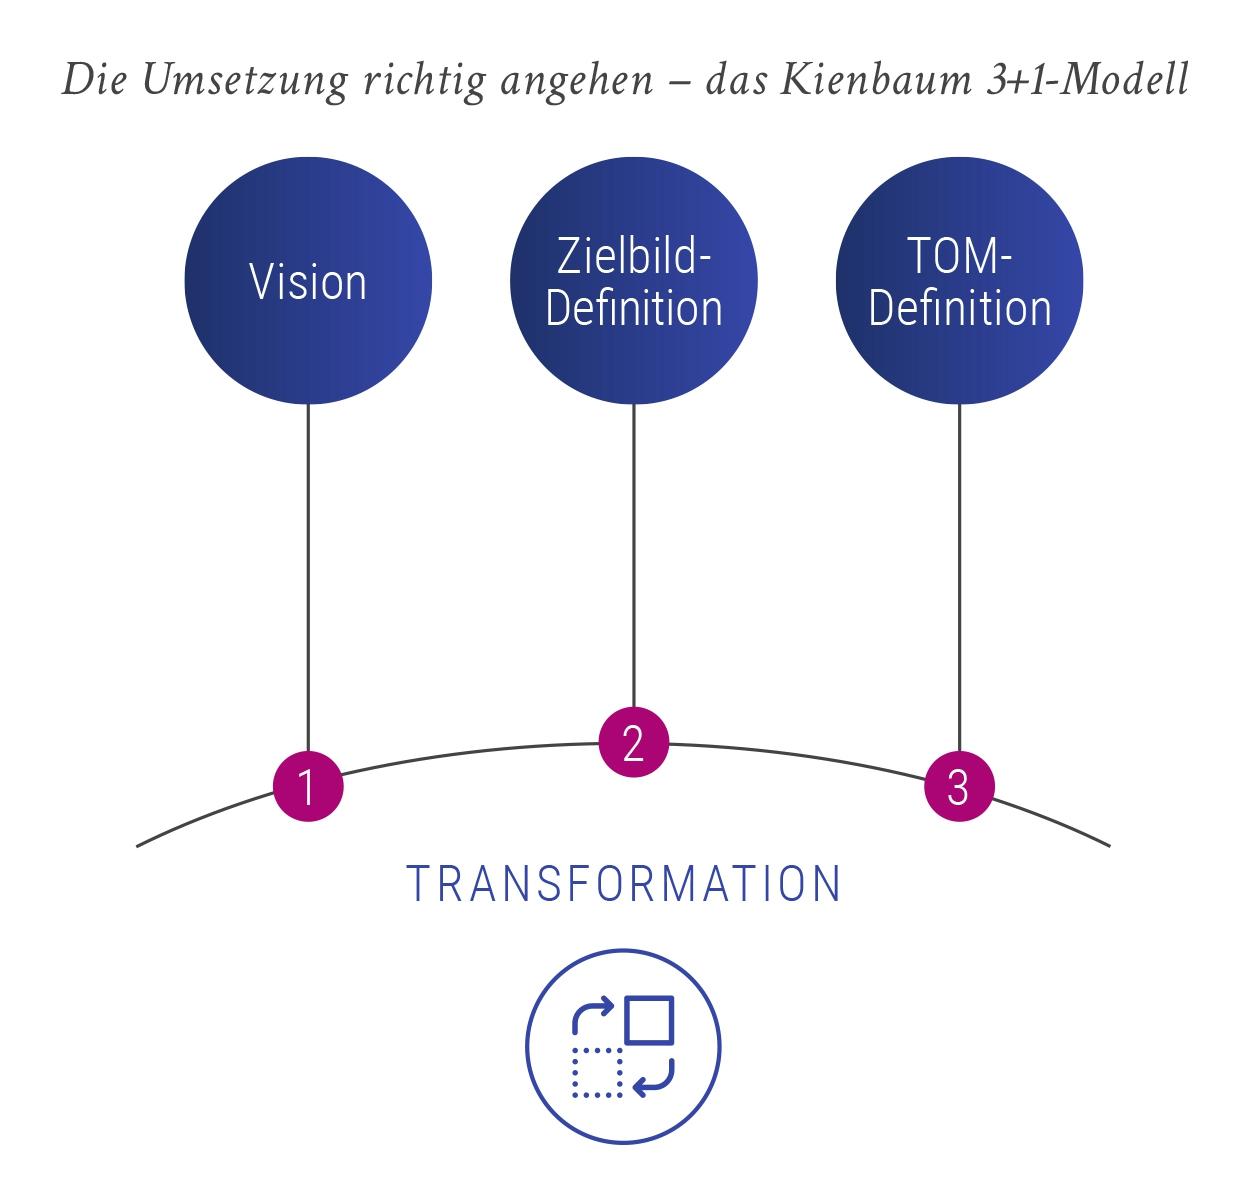 Das Kienbaum 3+1-Modell